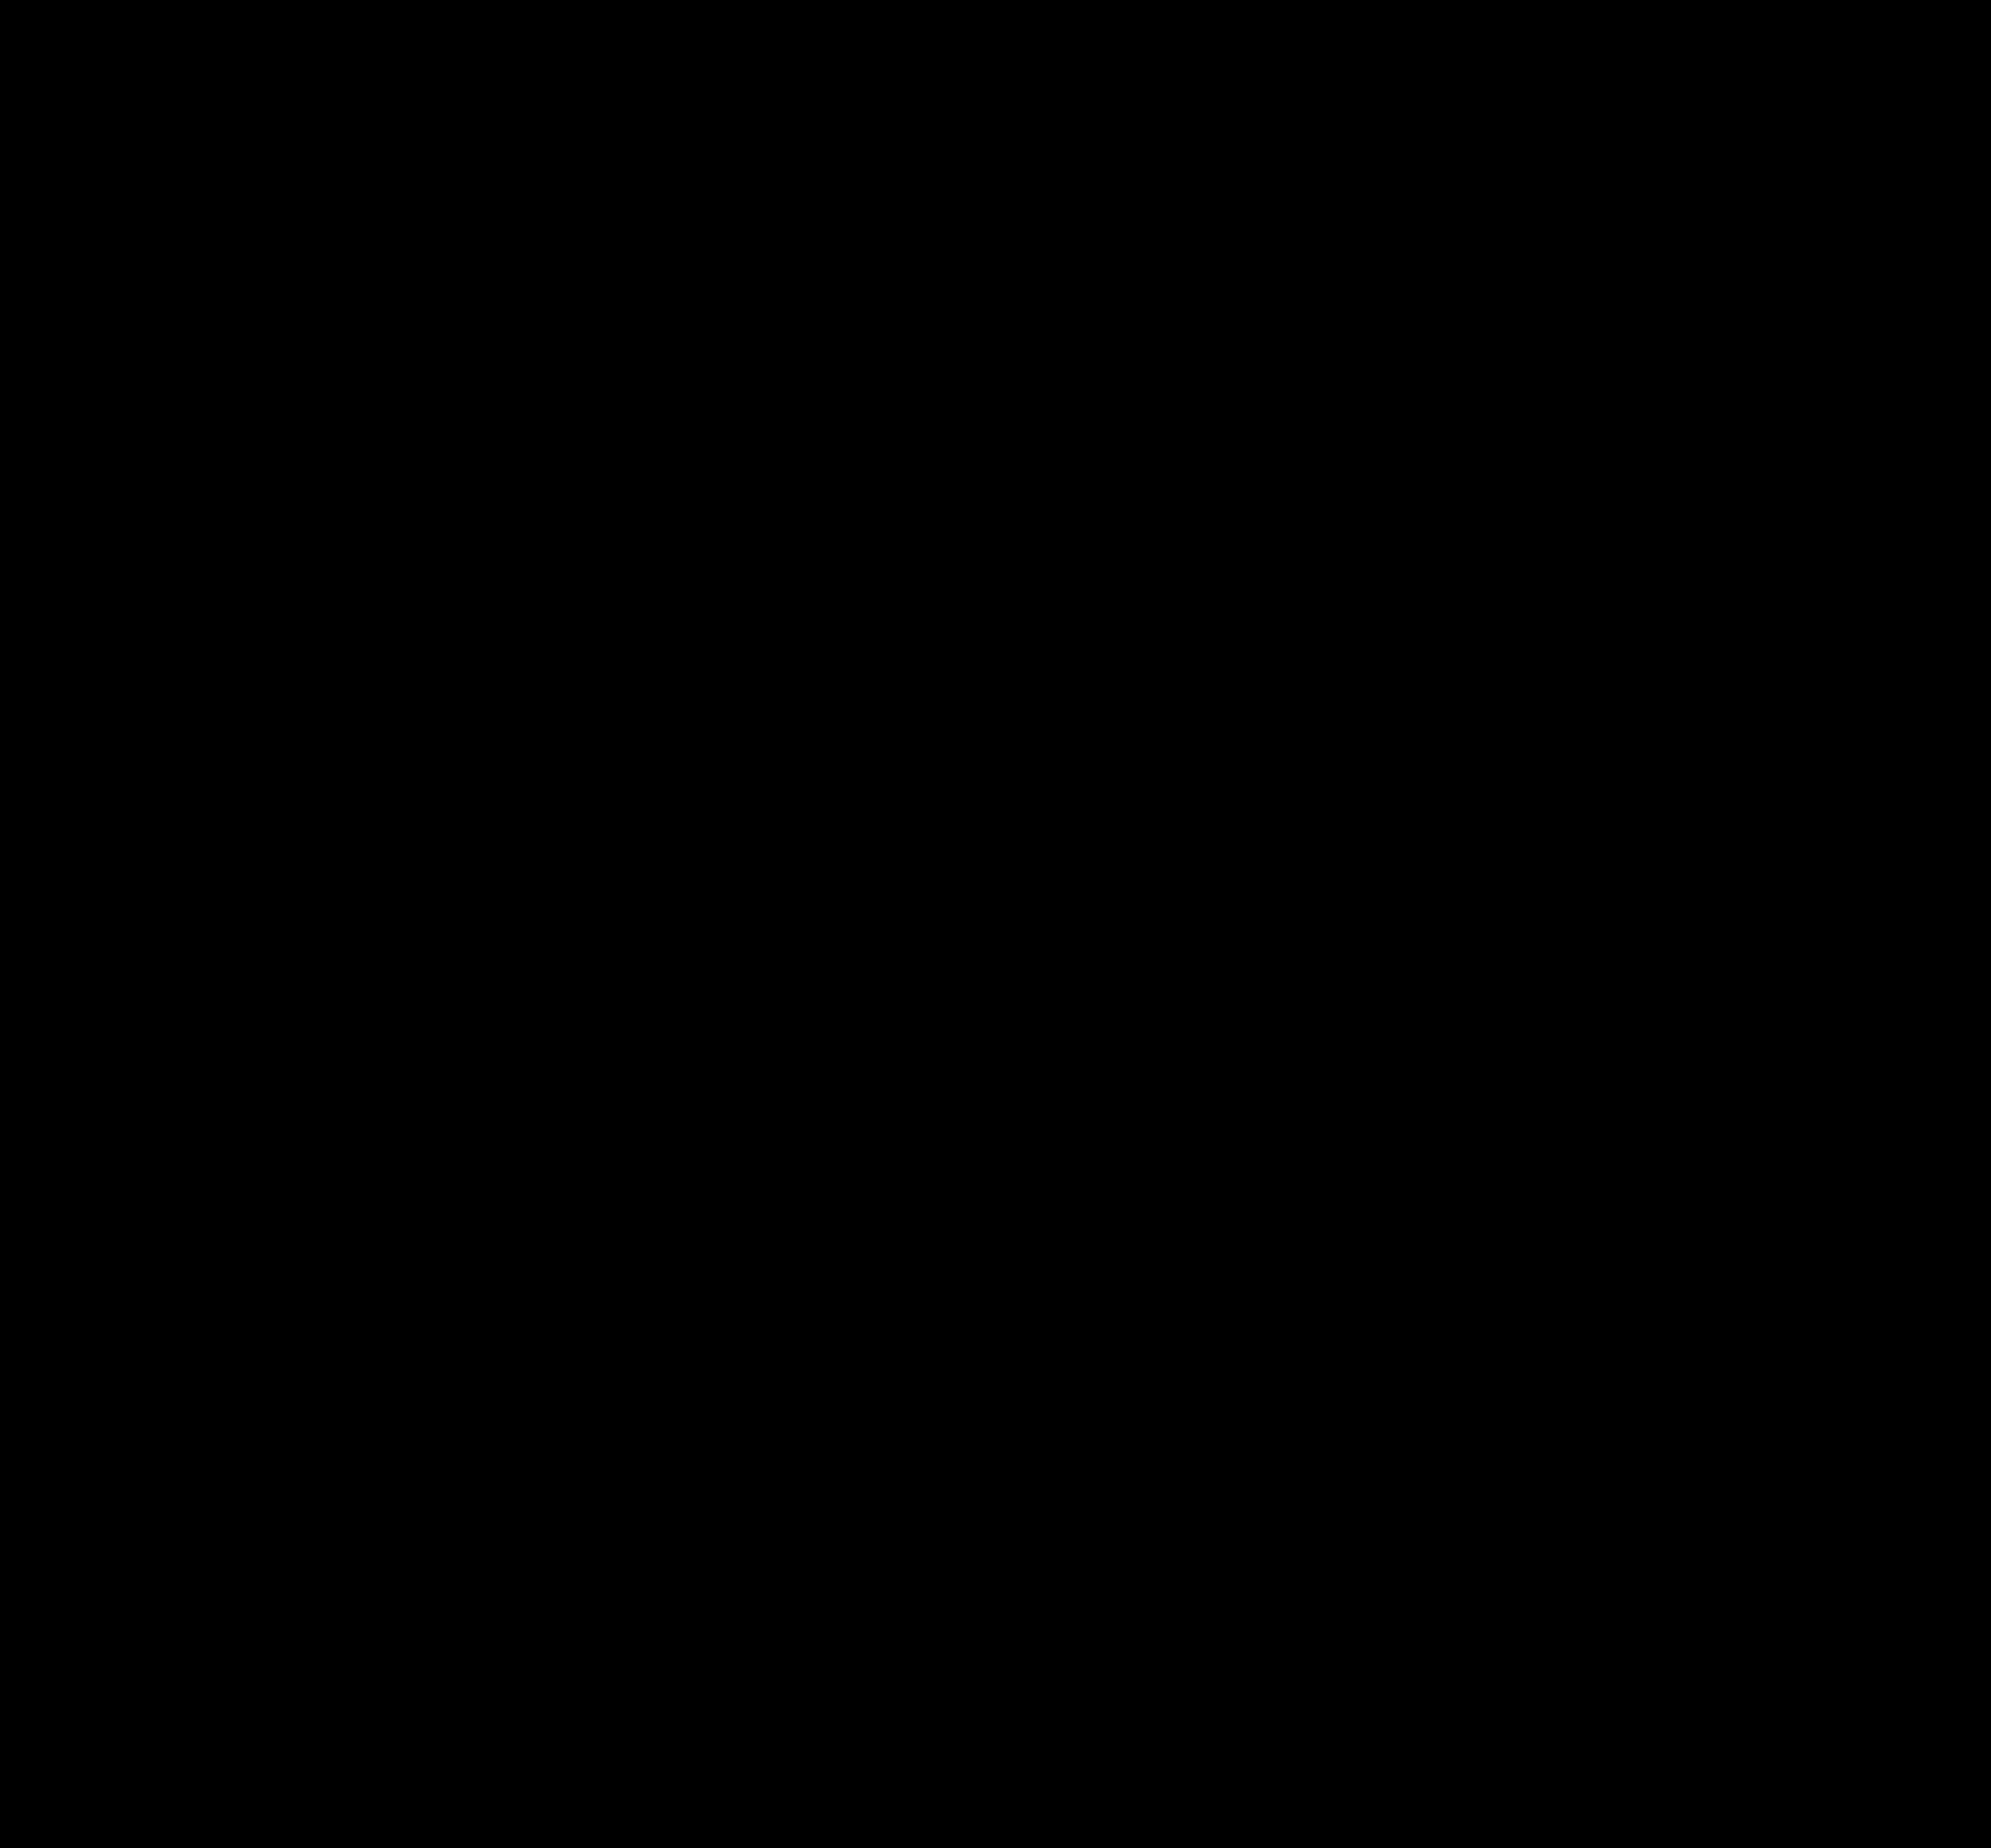 2290x2126 Clipart